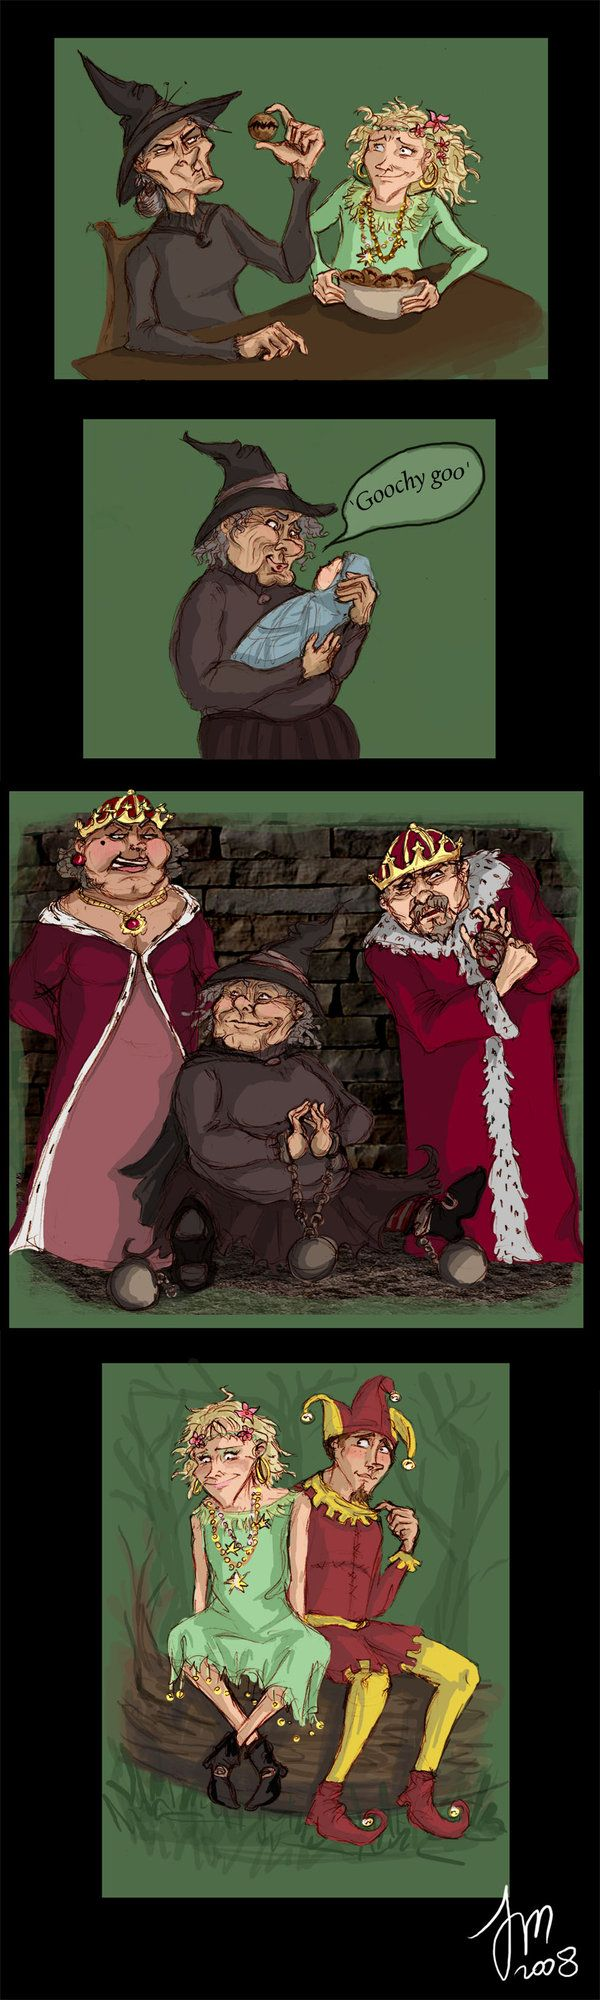 Pratchett doodles-Wyrd Sisters by yenefer.deviantart.com on @deviantART